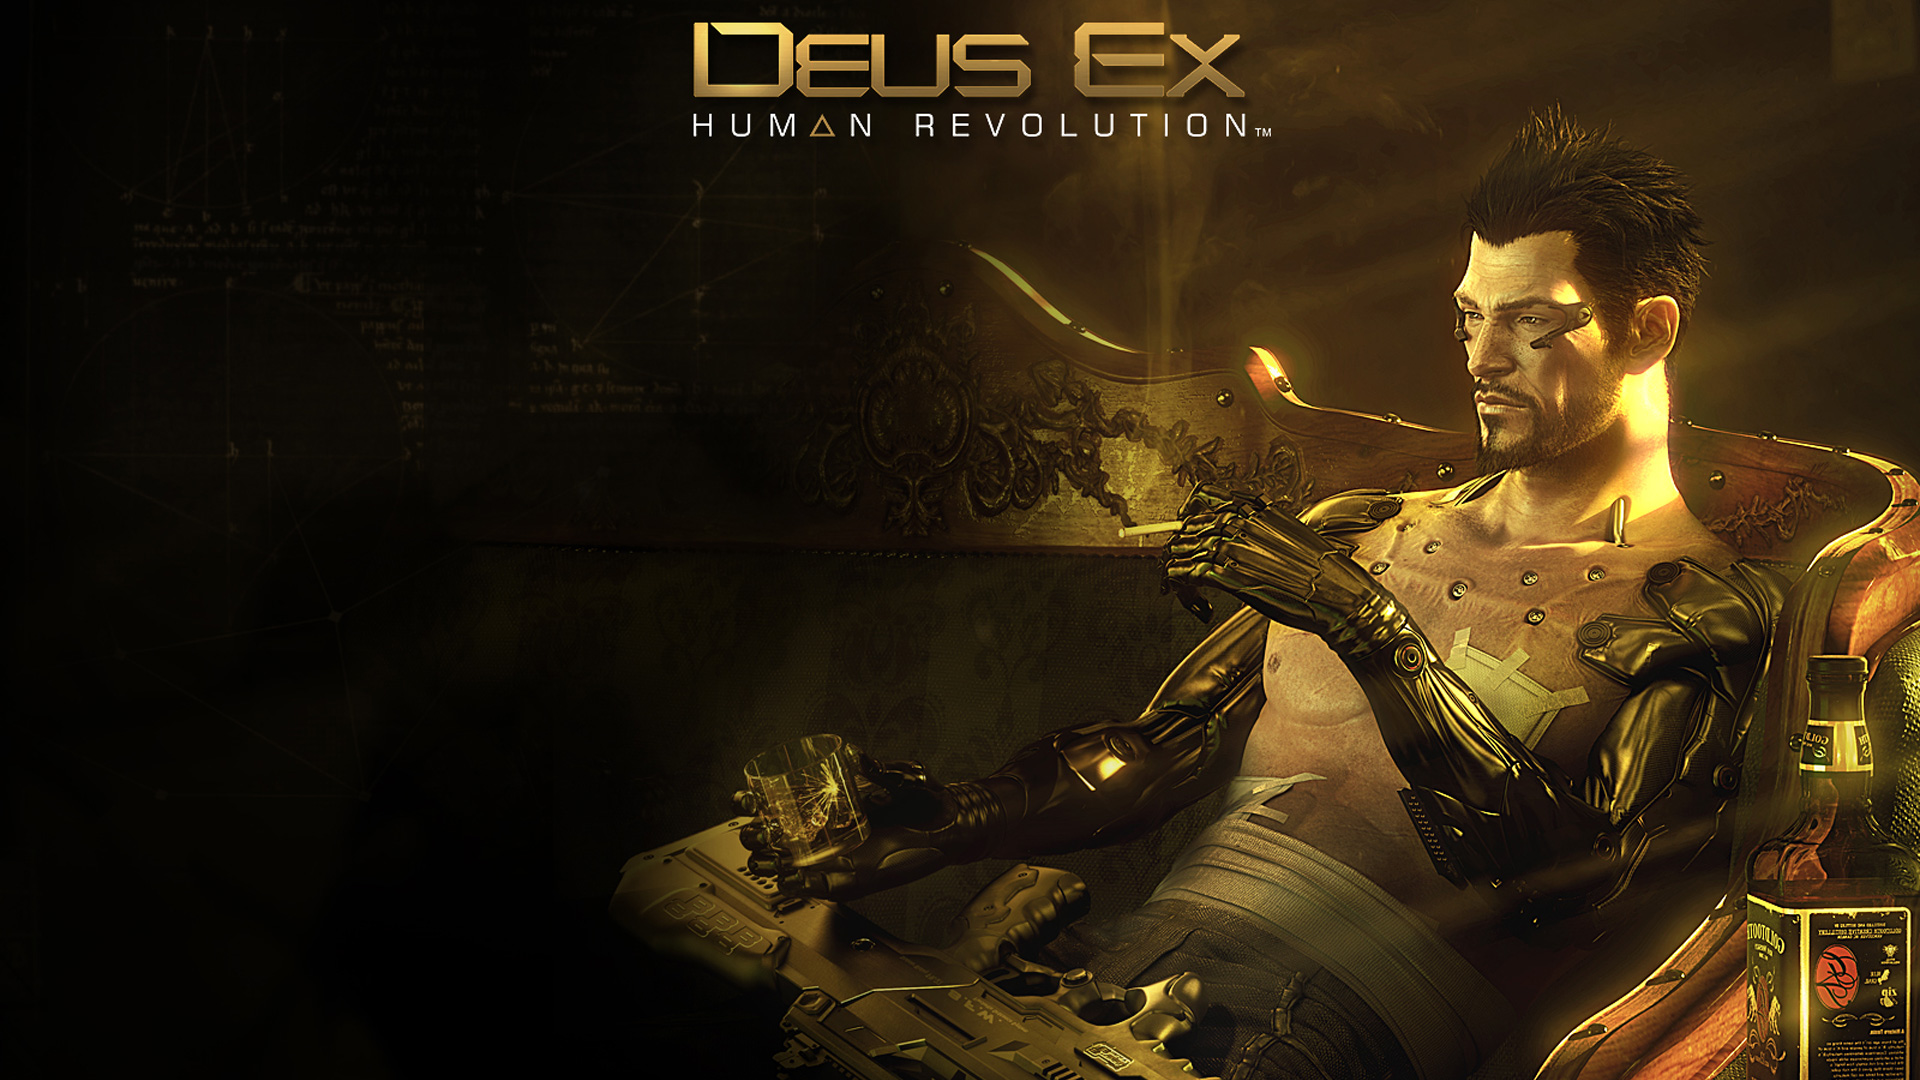 Free Deus Ex: Human Revolution Wallpaper in 1920x1080